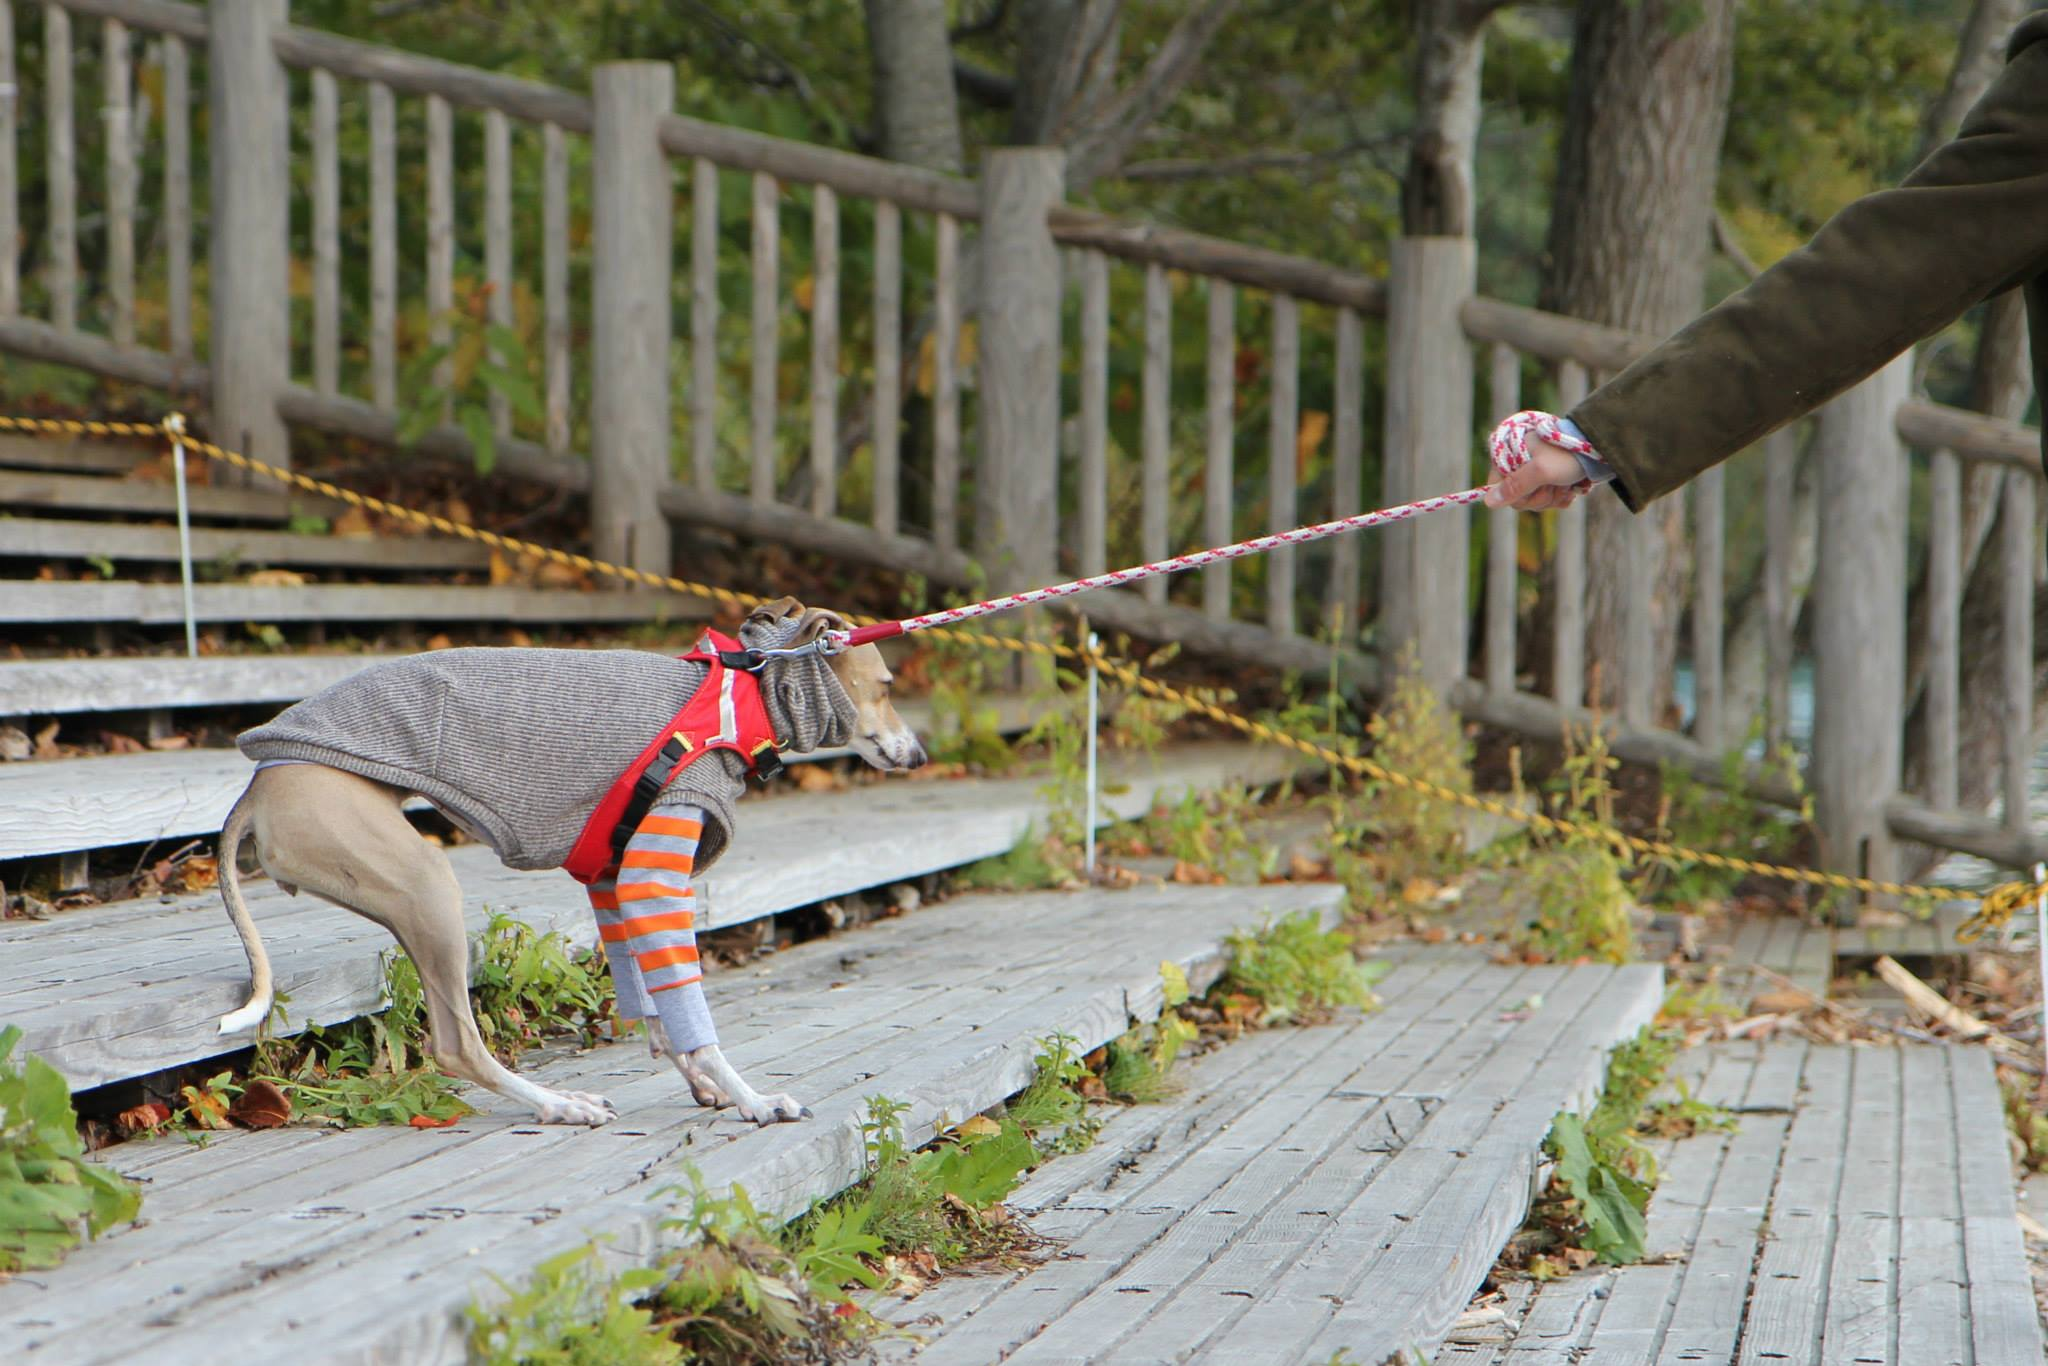 Ridicuul geklede hond wil niet het water in bij Lake Shikotsu